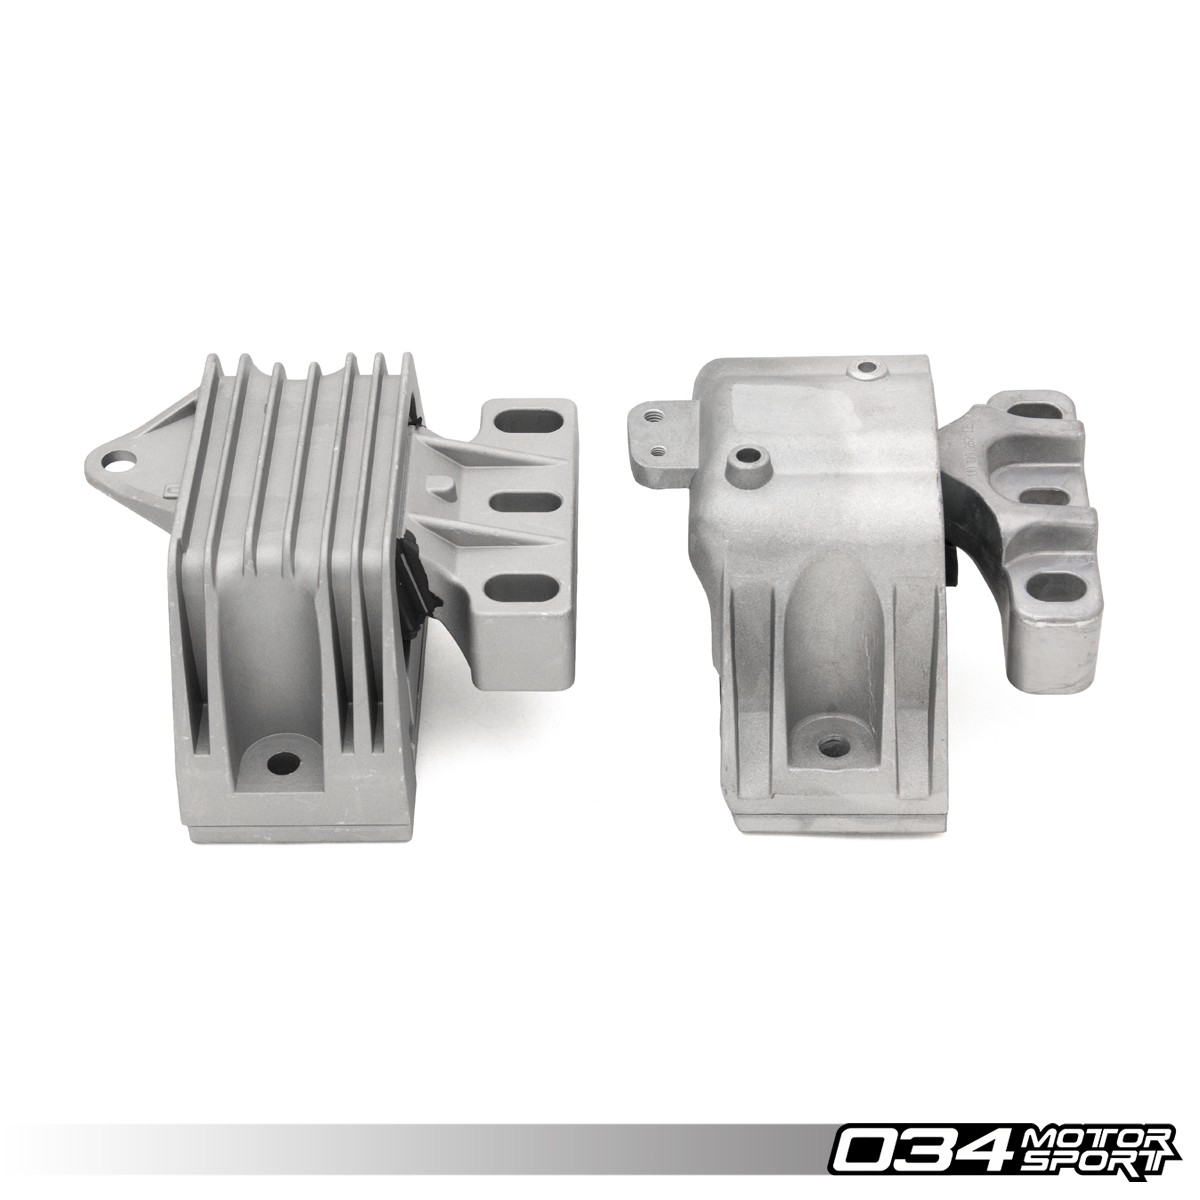 Motor Mount Pair, Density Line, MkIV Volkswagen, 8N Audi, 2.8L & 3.2L VR6 | 034-509-5006